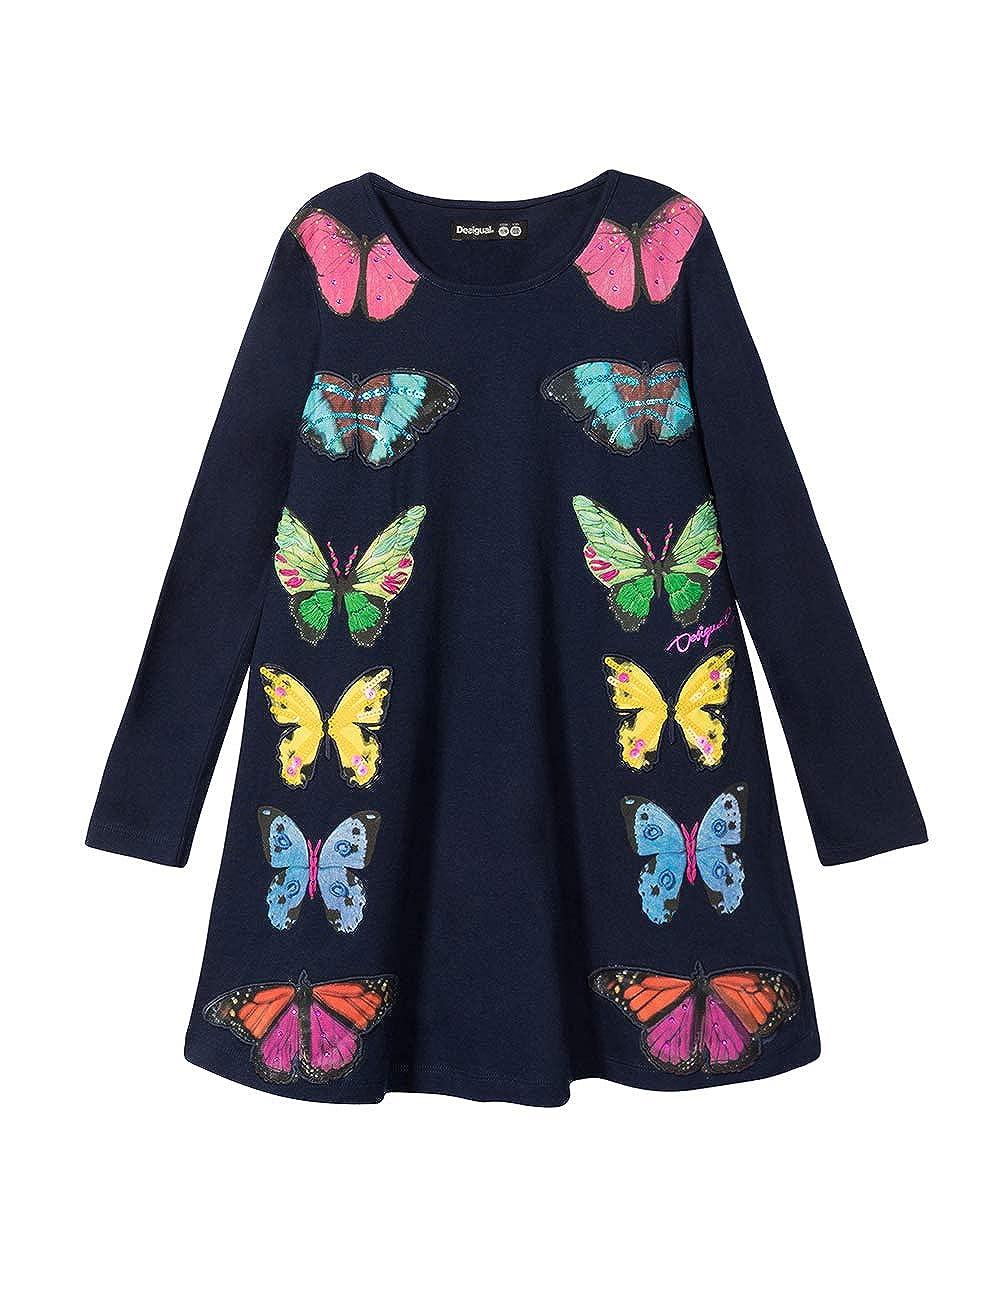 Desigual Dress M/érida Vestito Bambina